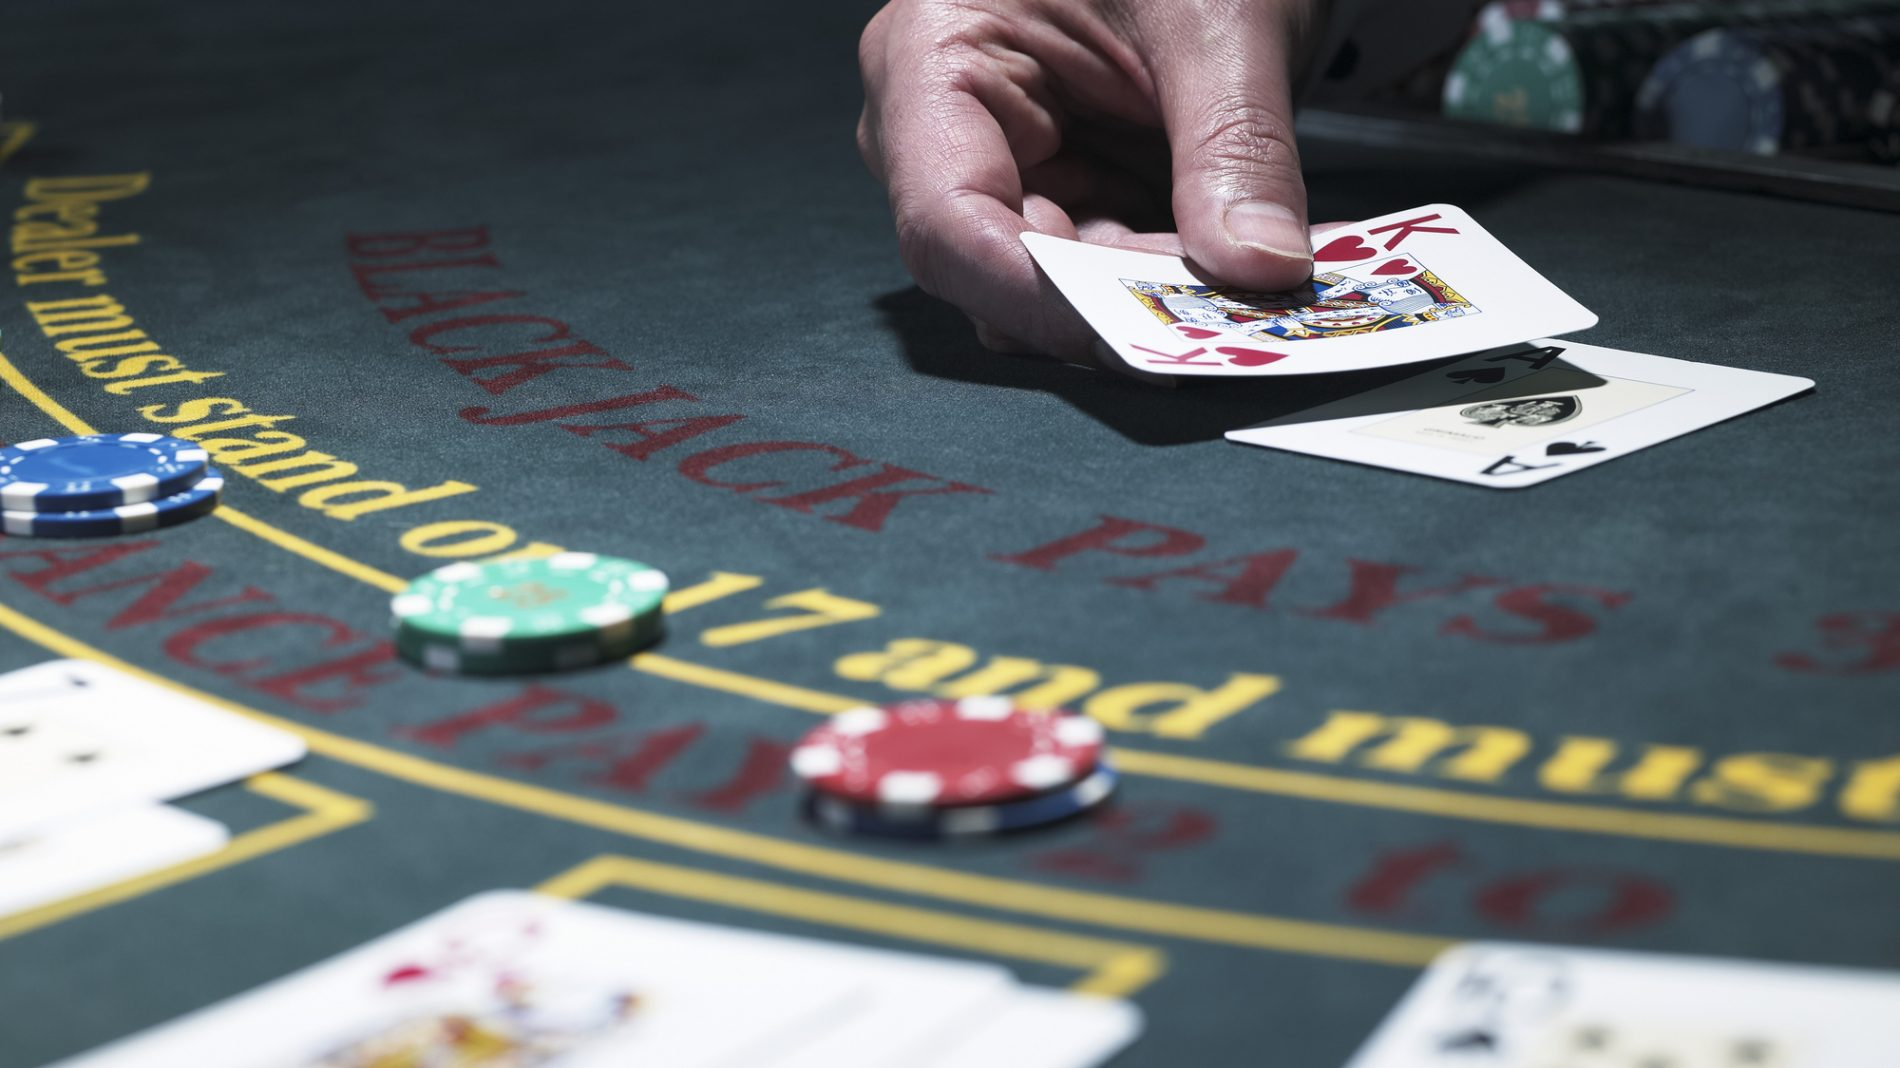 Man holding cards at blackjack table